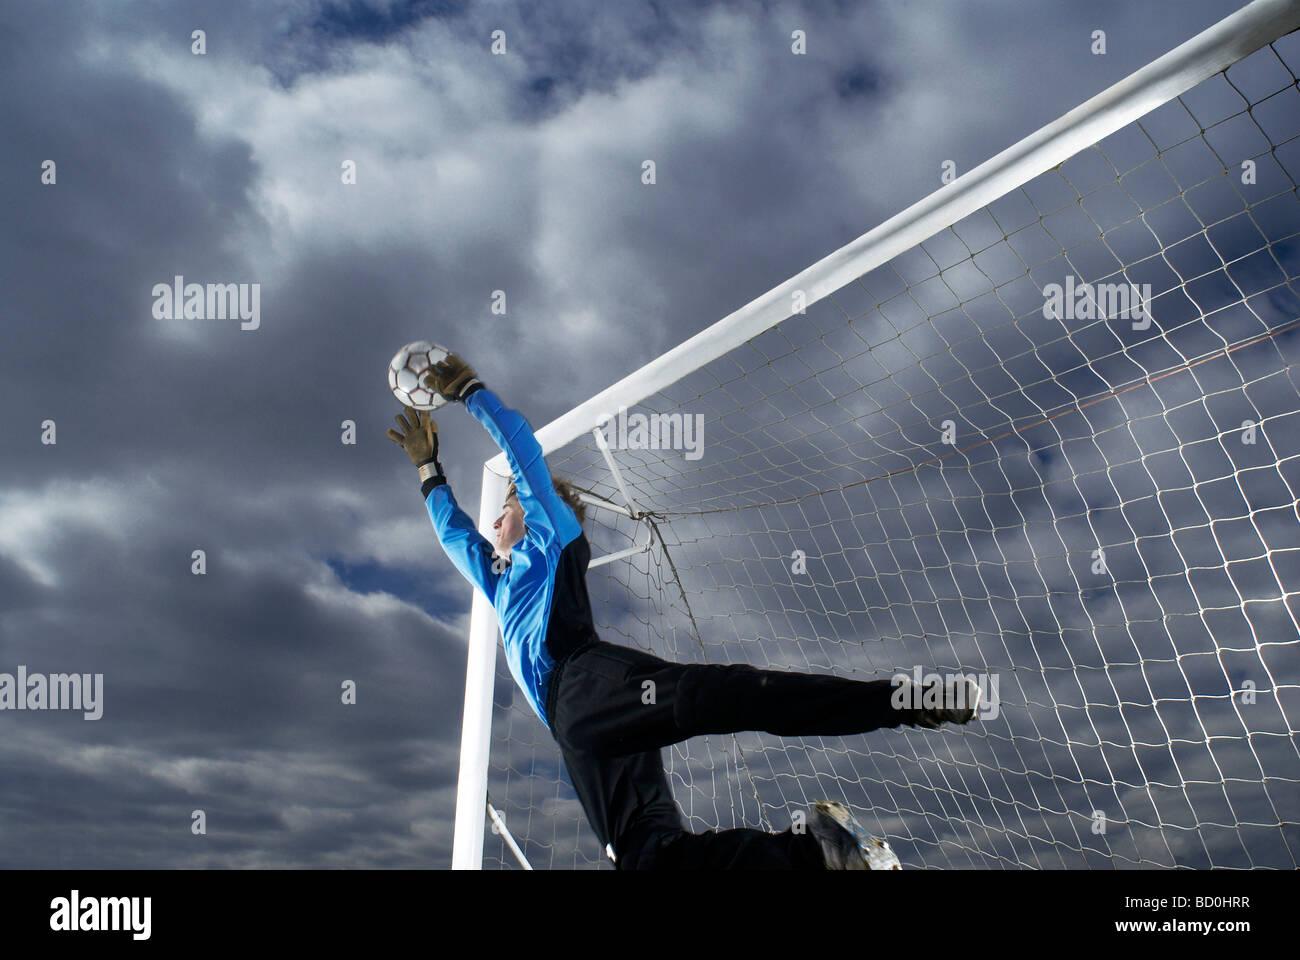 goalkeeper diving - Stock Image